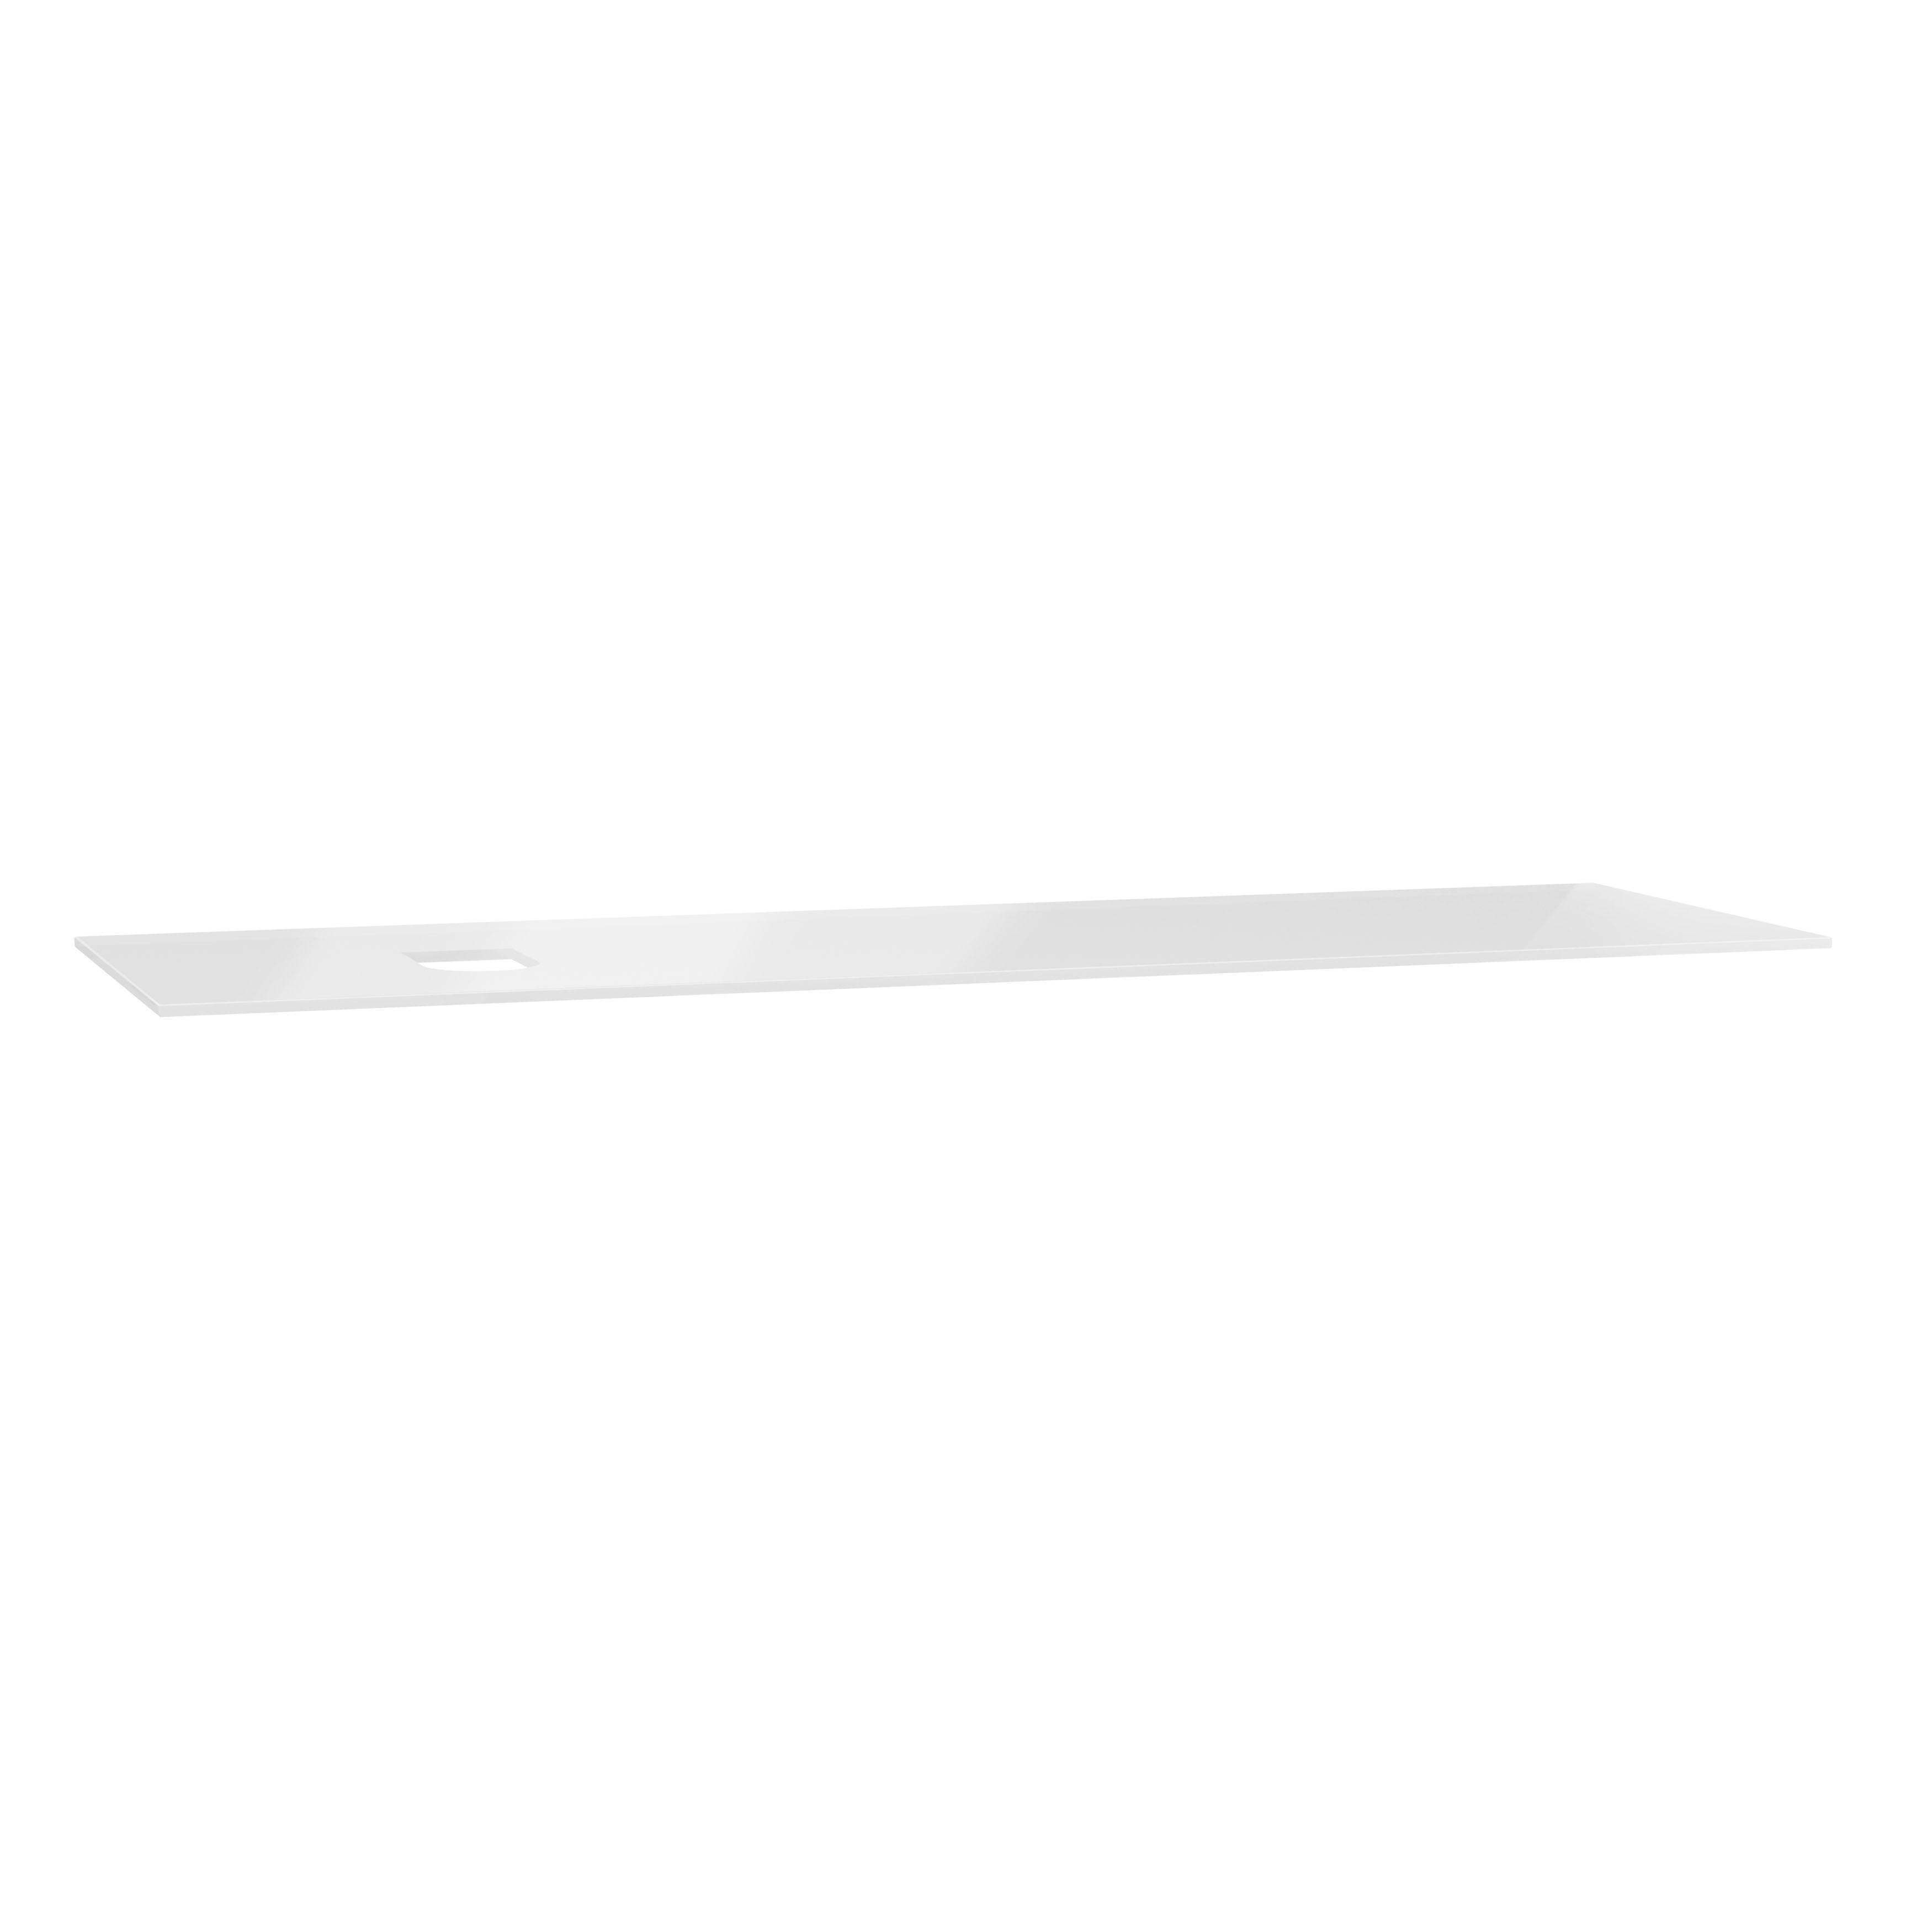 Origin plan de toilette, 150 cm, verre blanc, gauche